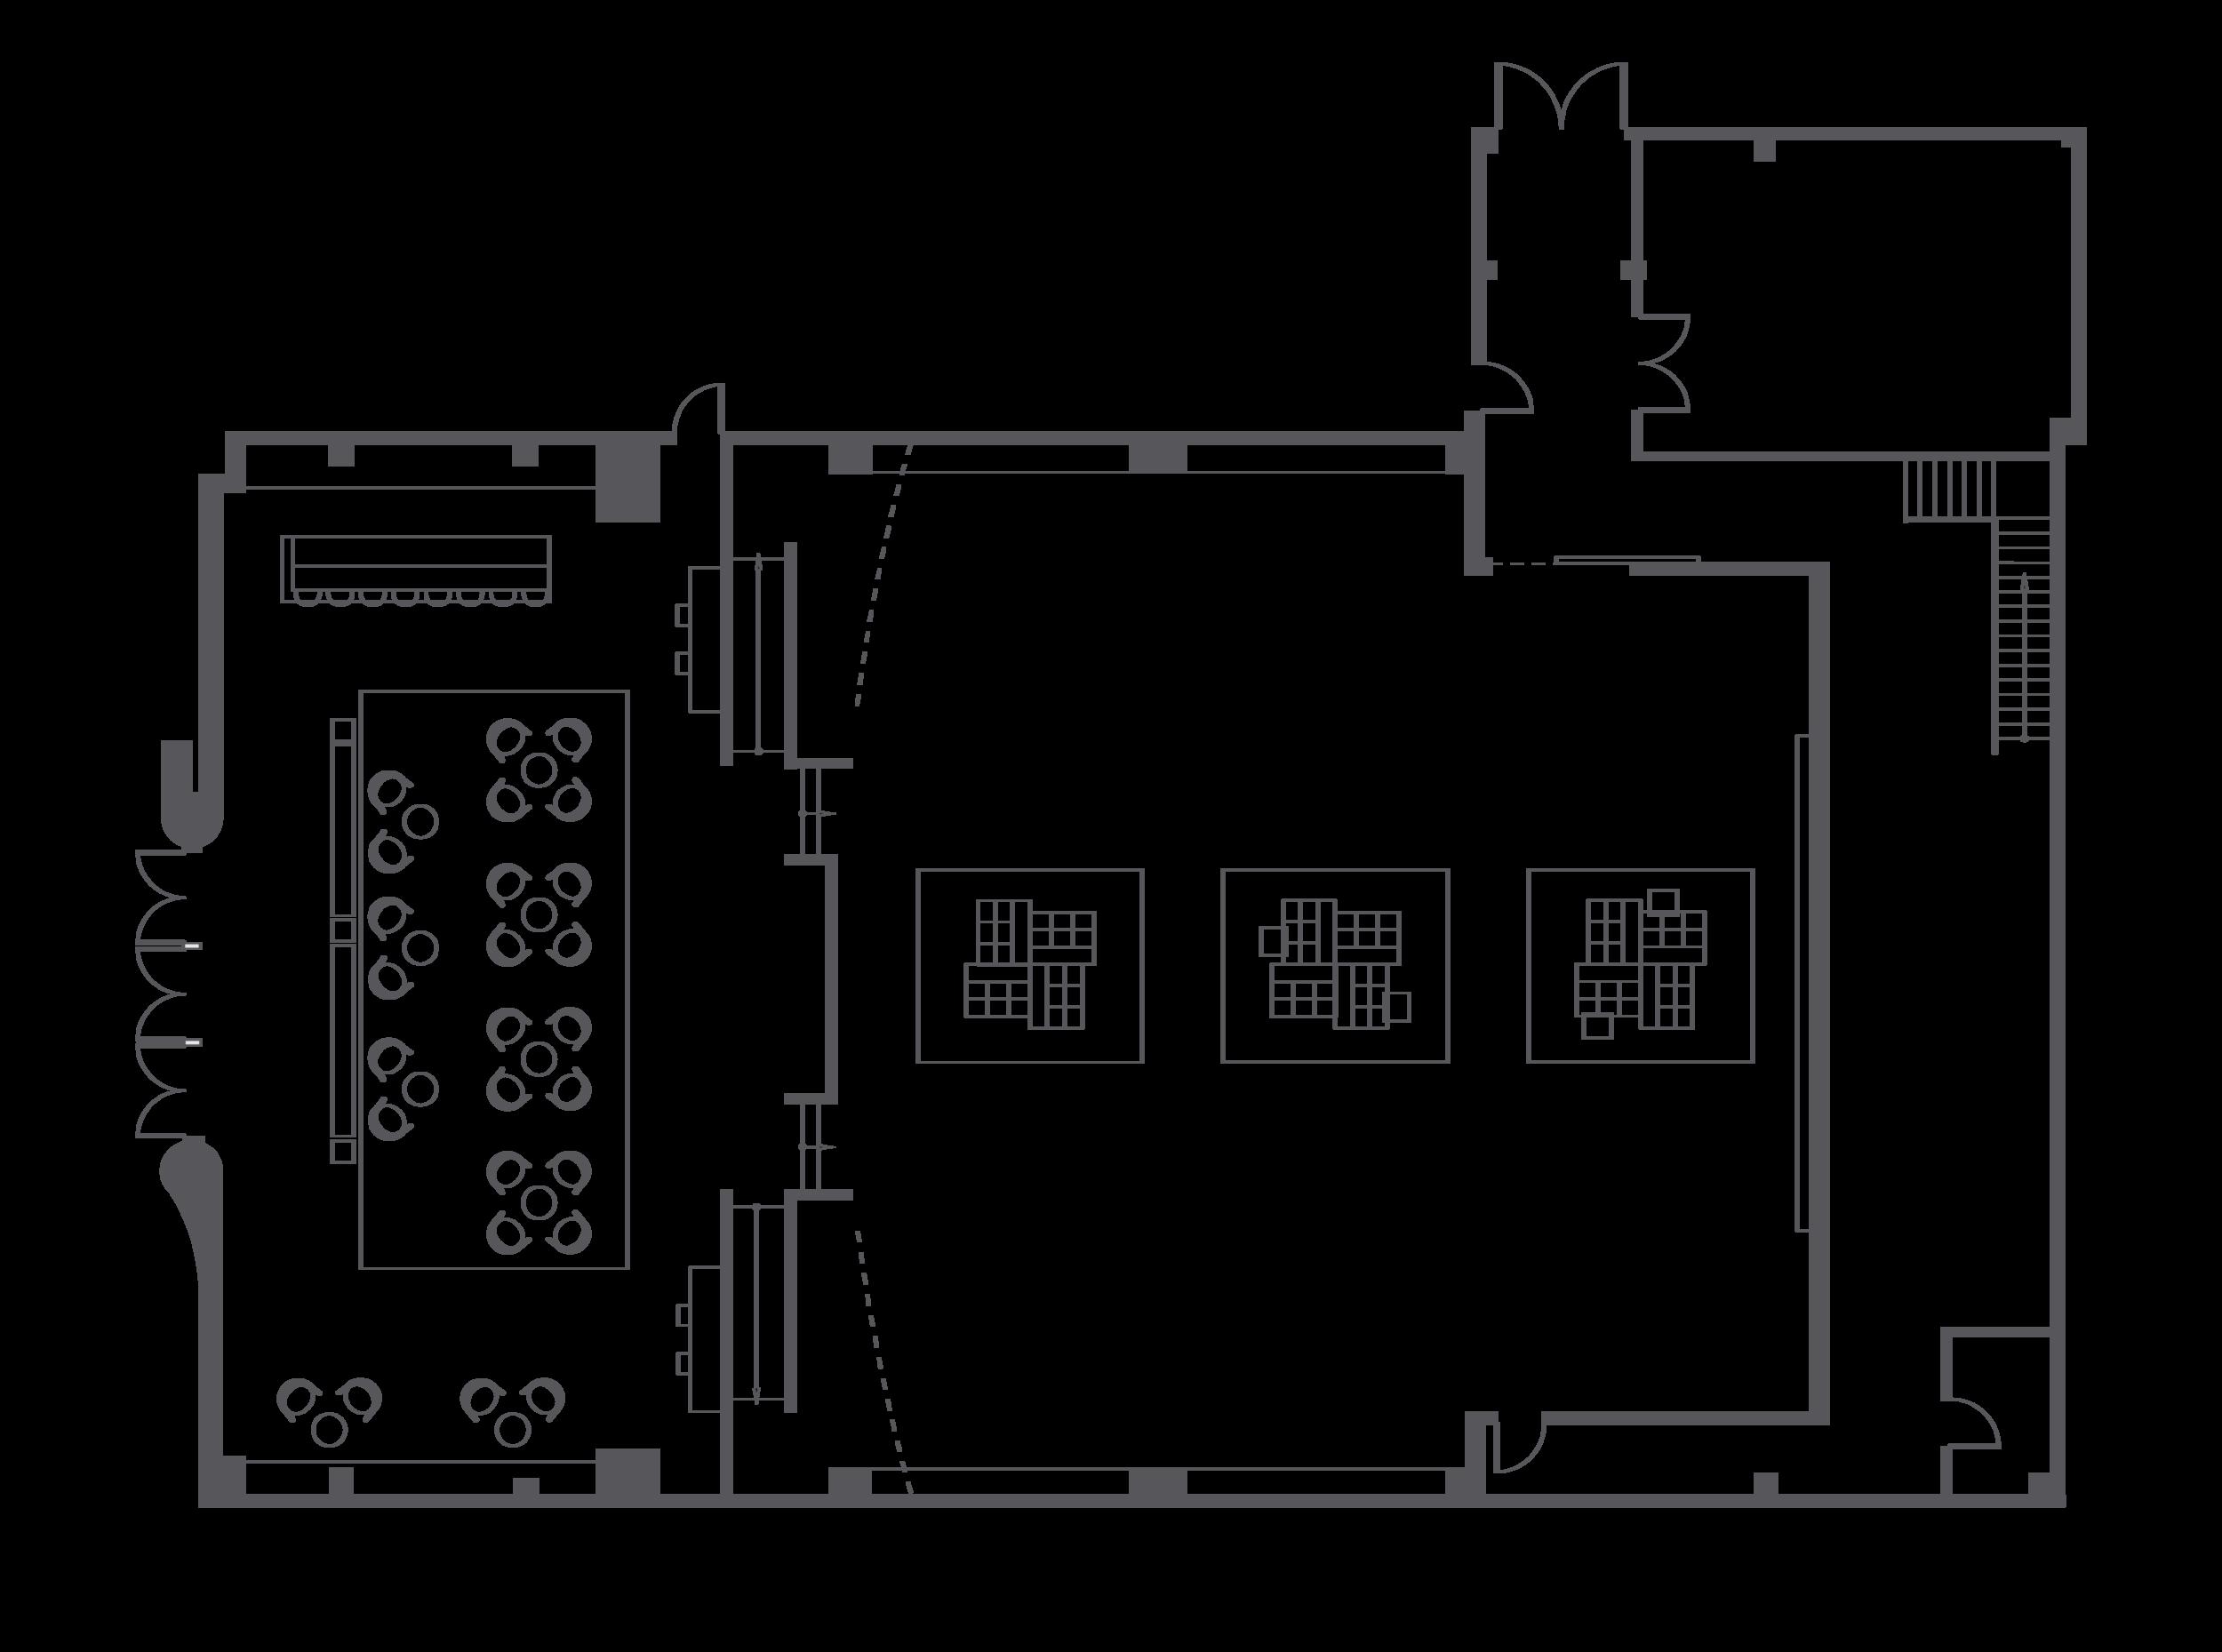 NHLA_Plan_3-Studio A-Green-Micro_v2-01.png